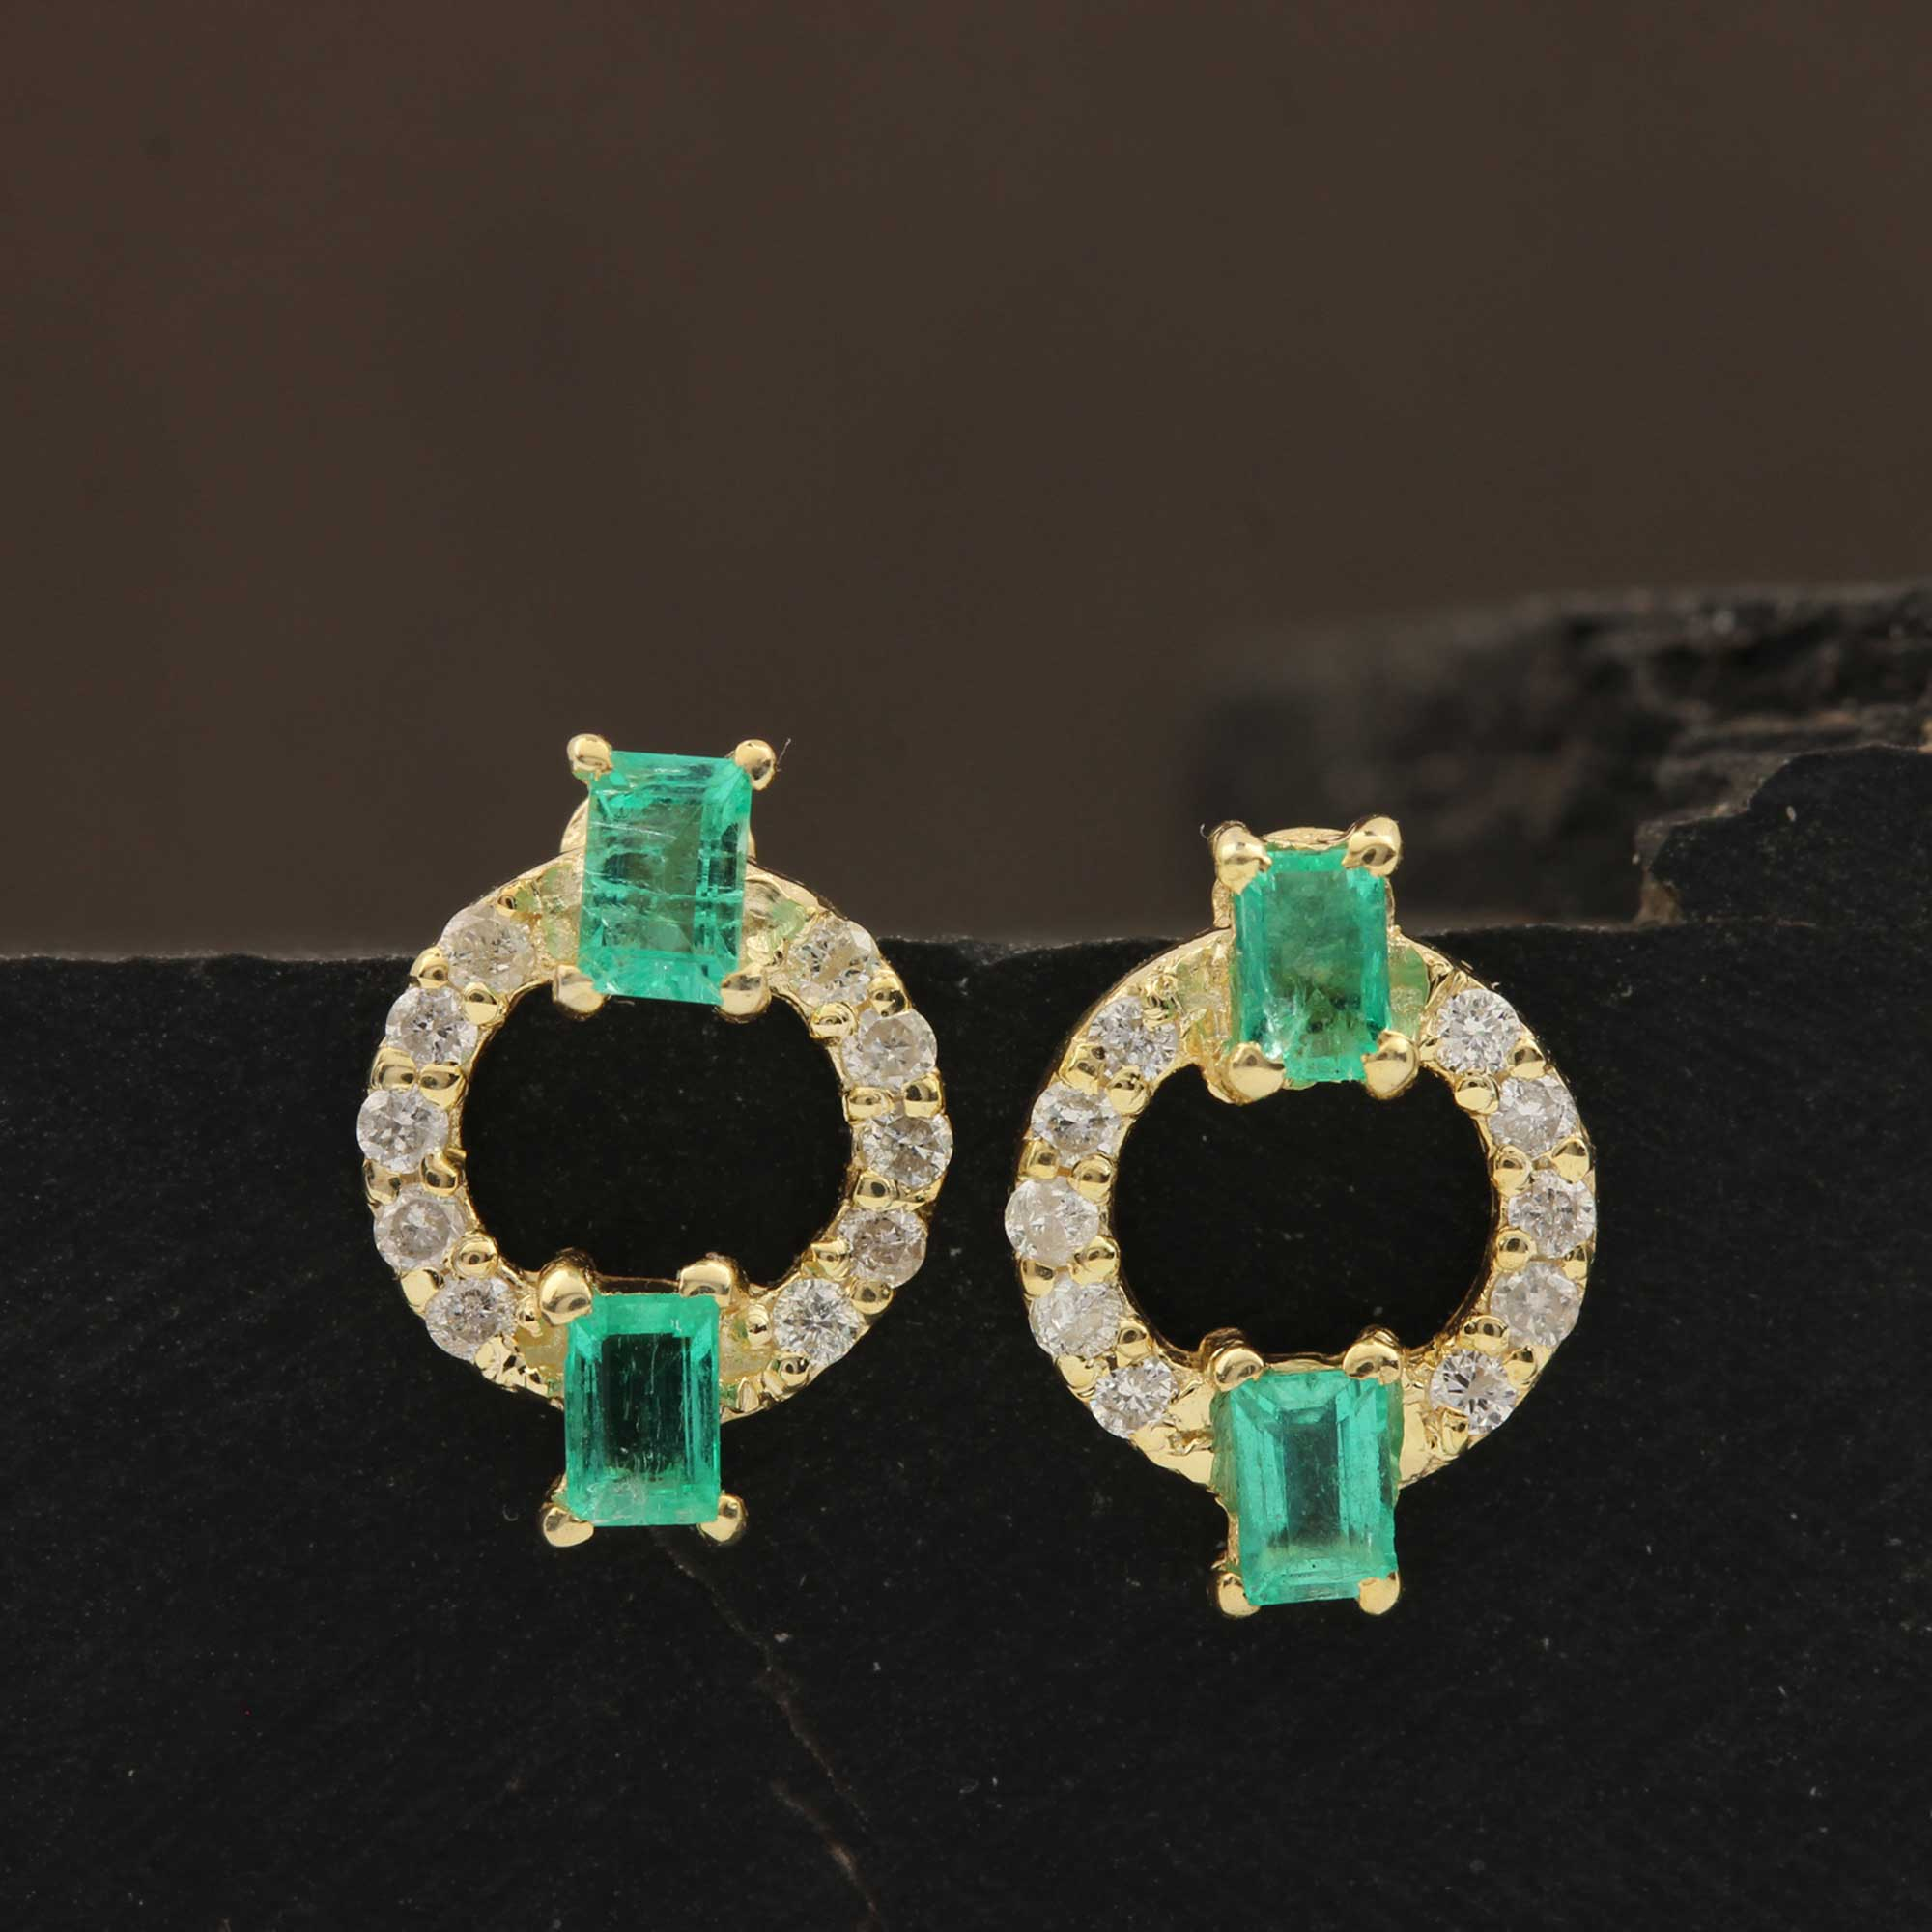 14k Solid Gold Natural Diamond Emerald Minimalist Round Stud Earrings